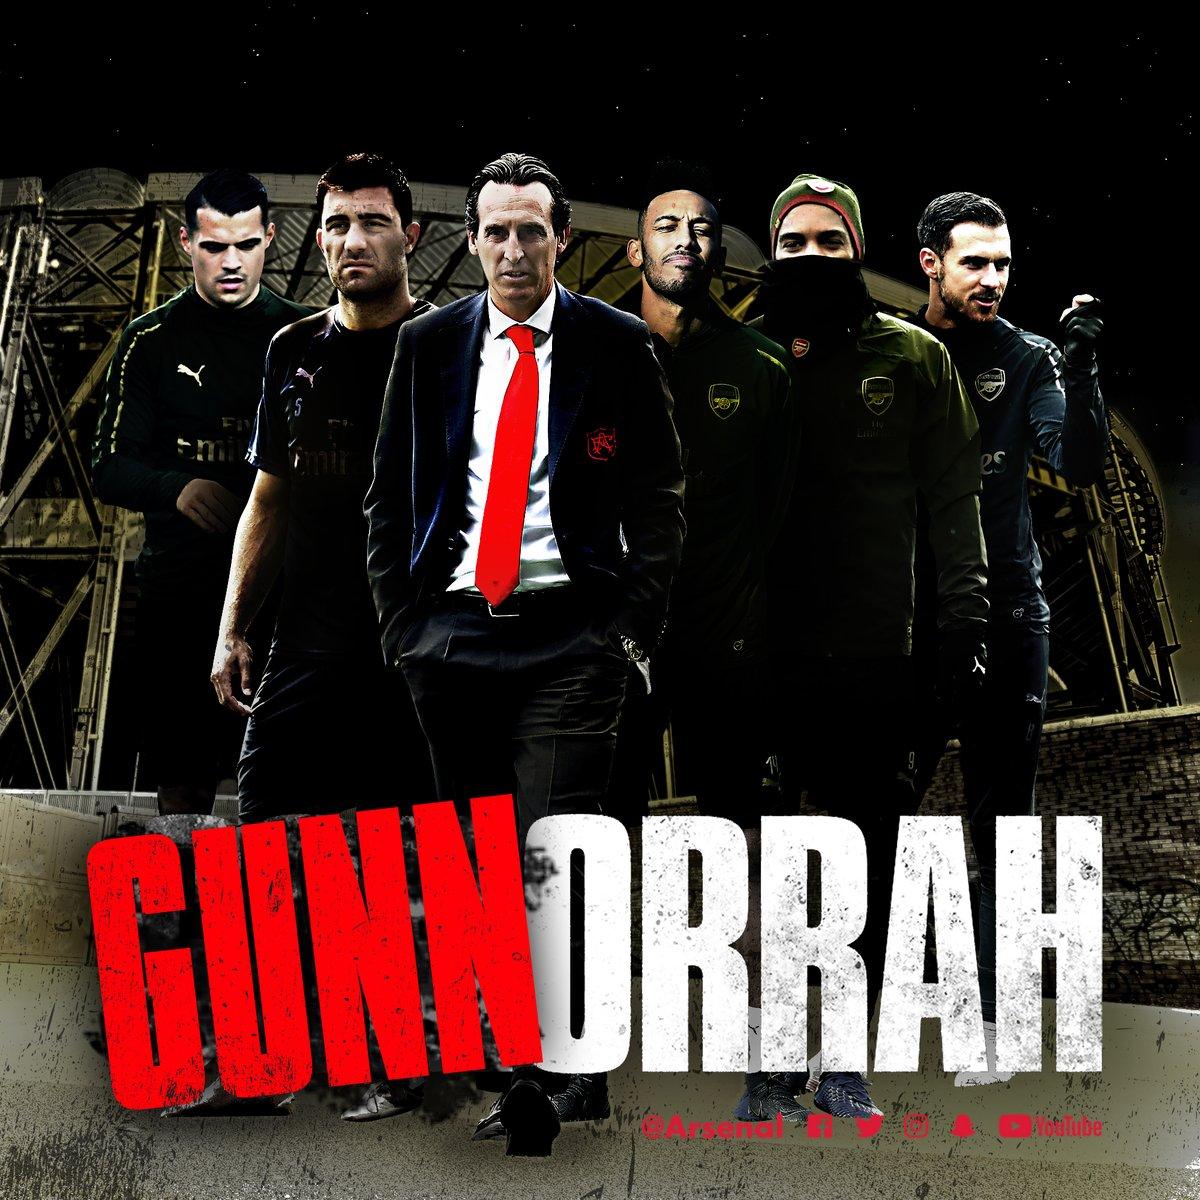 """Gunnorrah"", e l'Arsenal festeggia con un discutibile tweet"